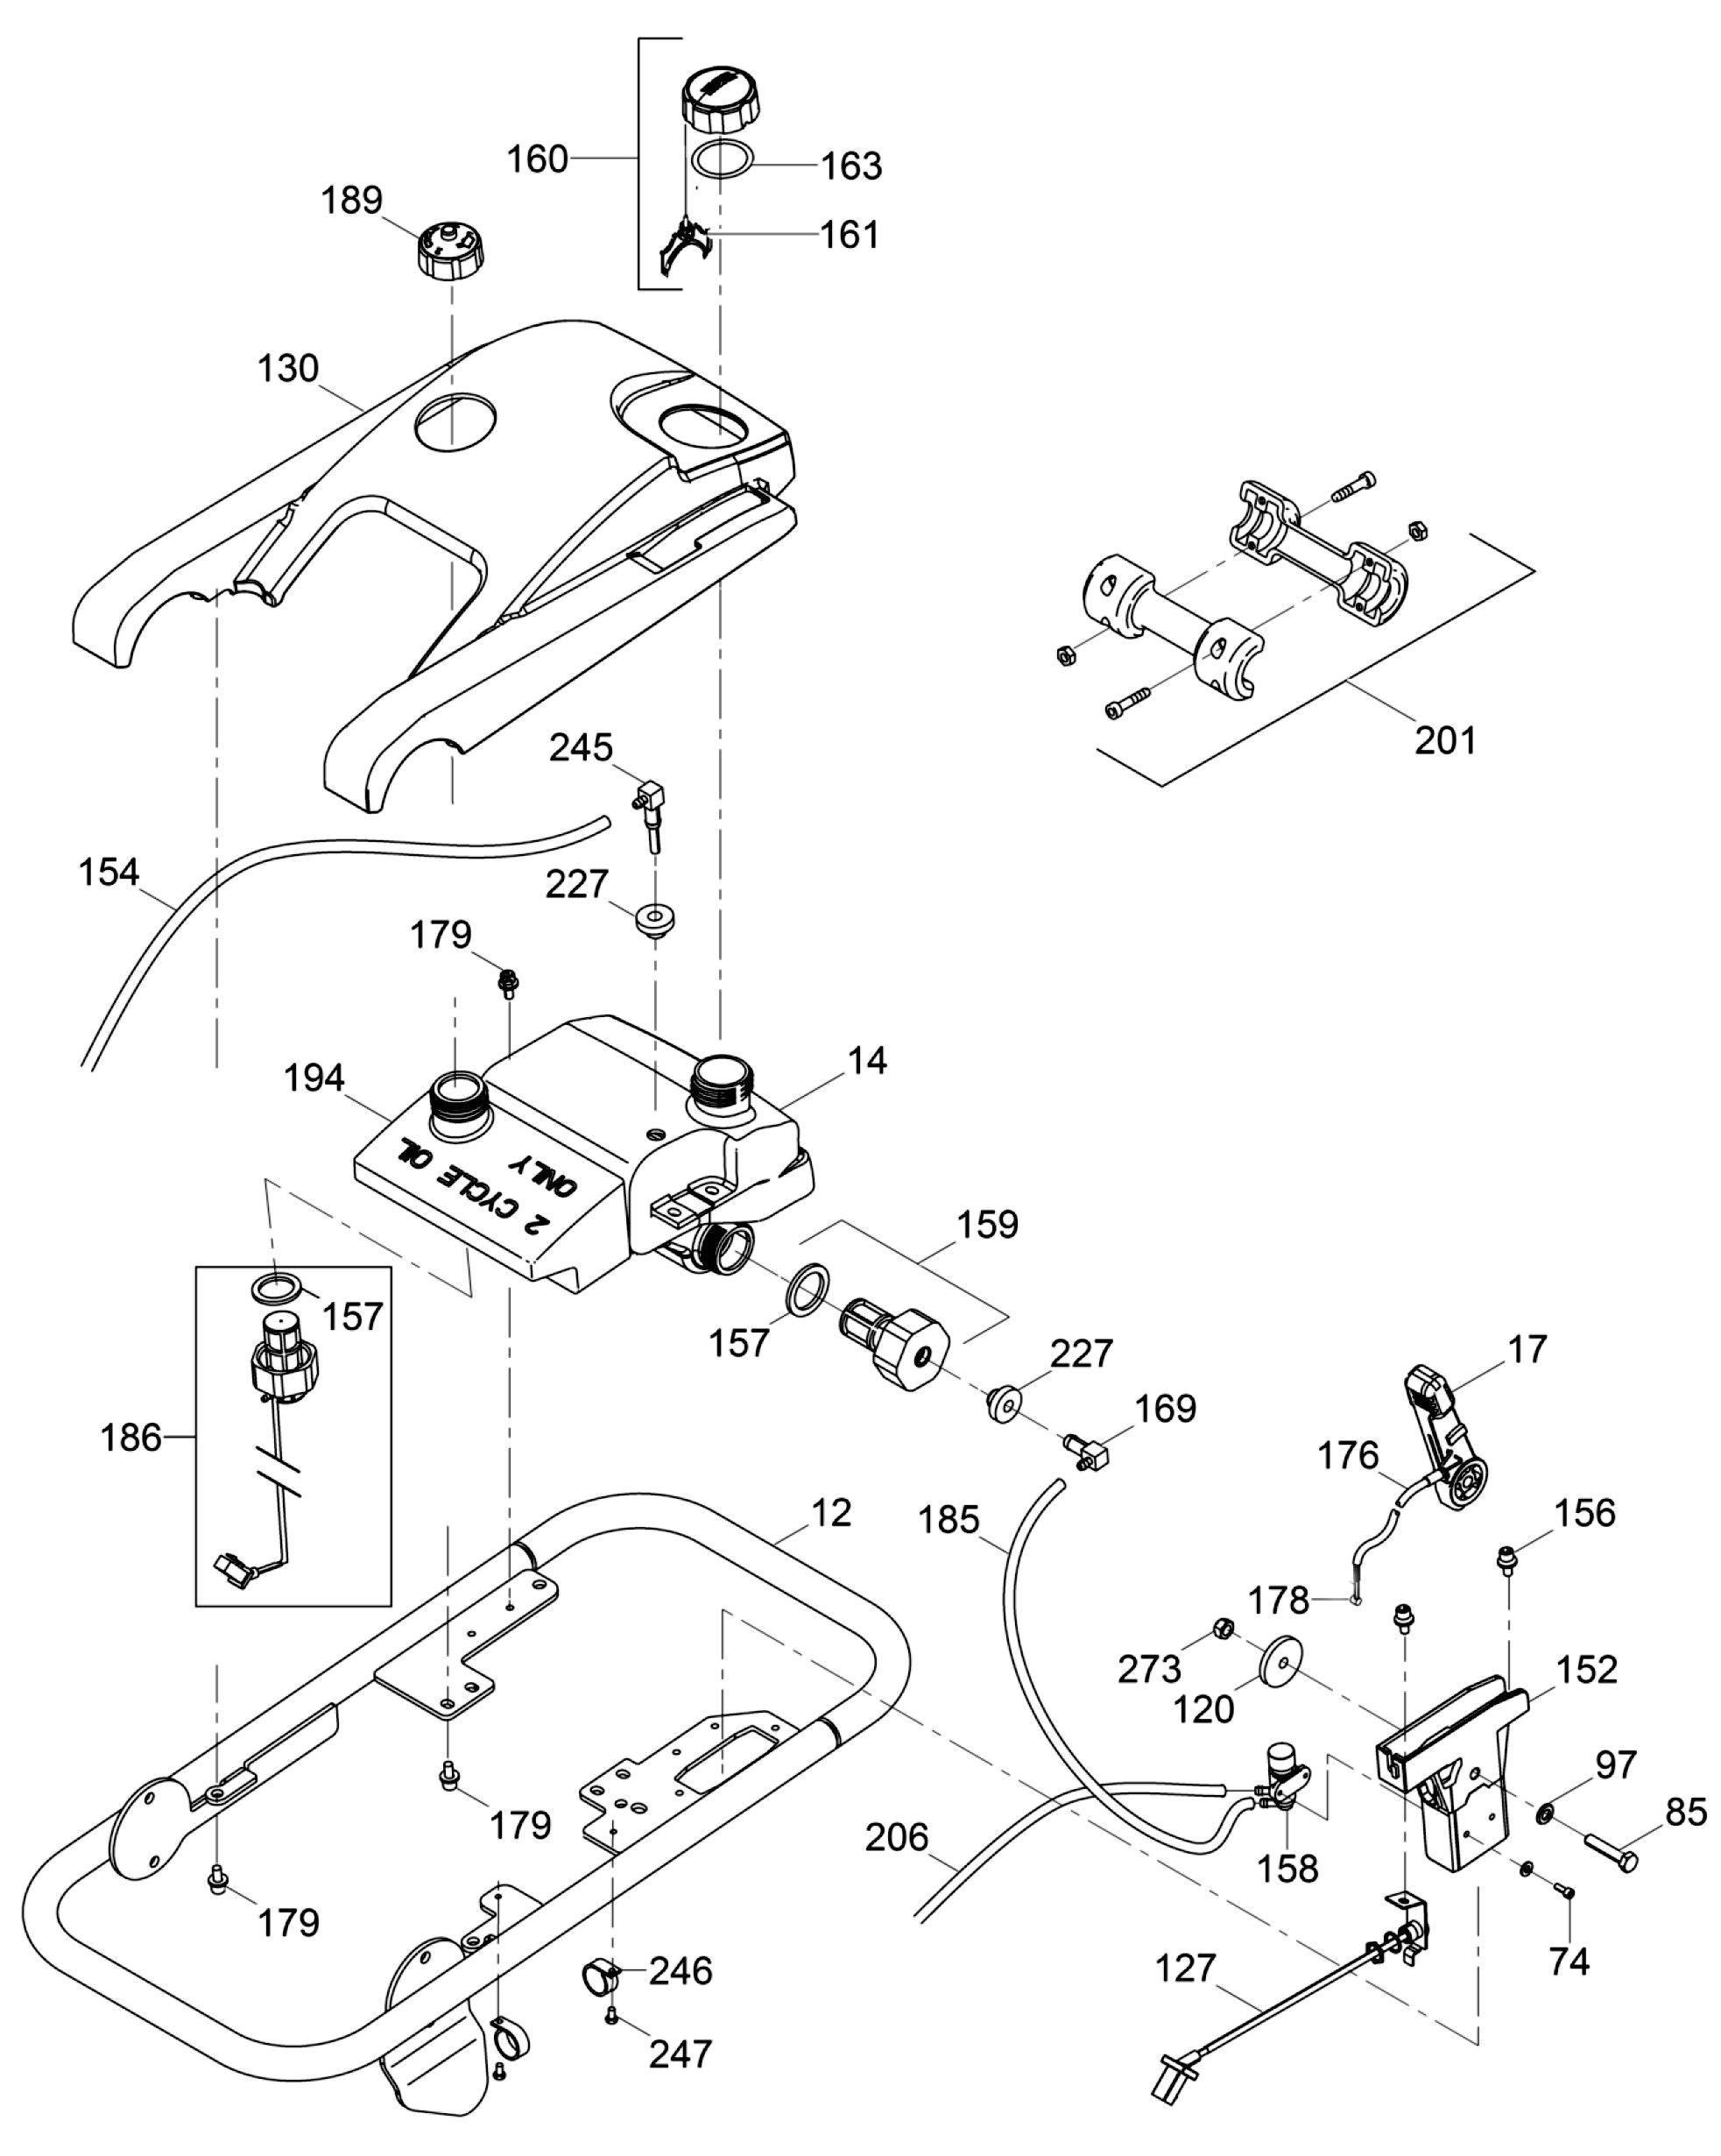 barford dumper wiring diagram 29 wiring diagram images